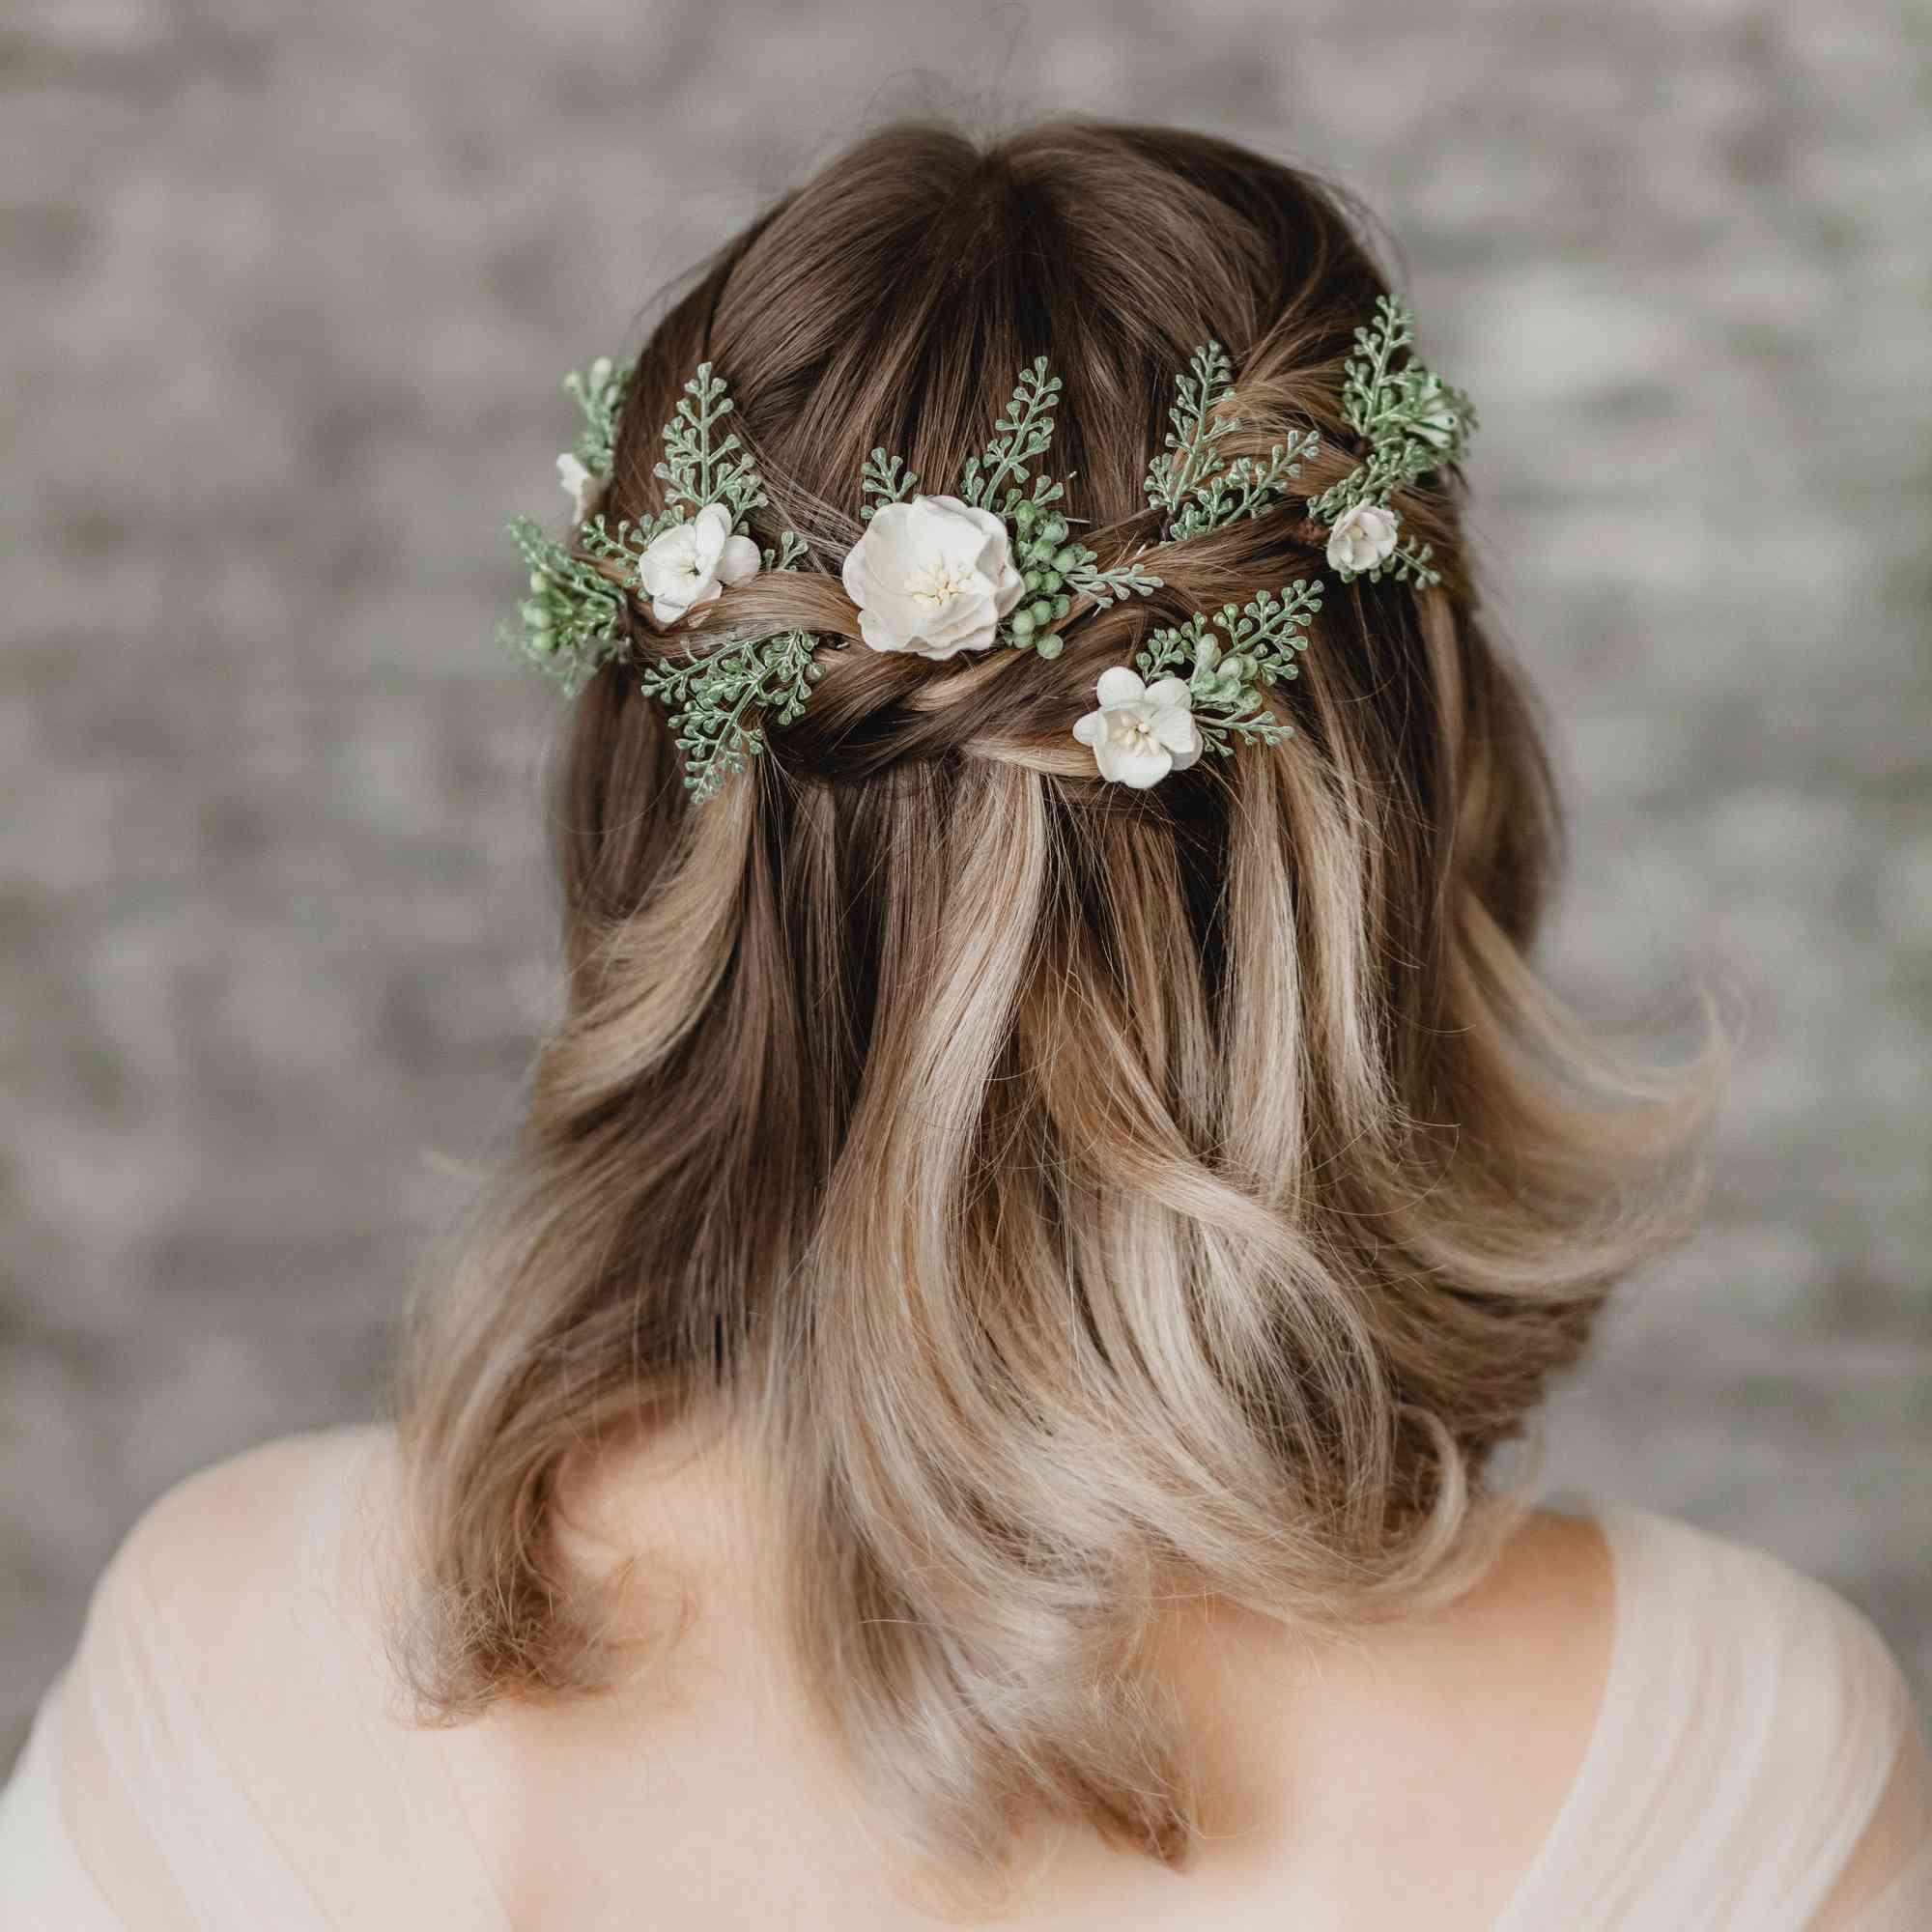 Bridal Off White Flower Faux Pearl Headpiece Wedding Hair Clip Fascinator